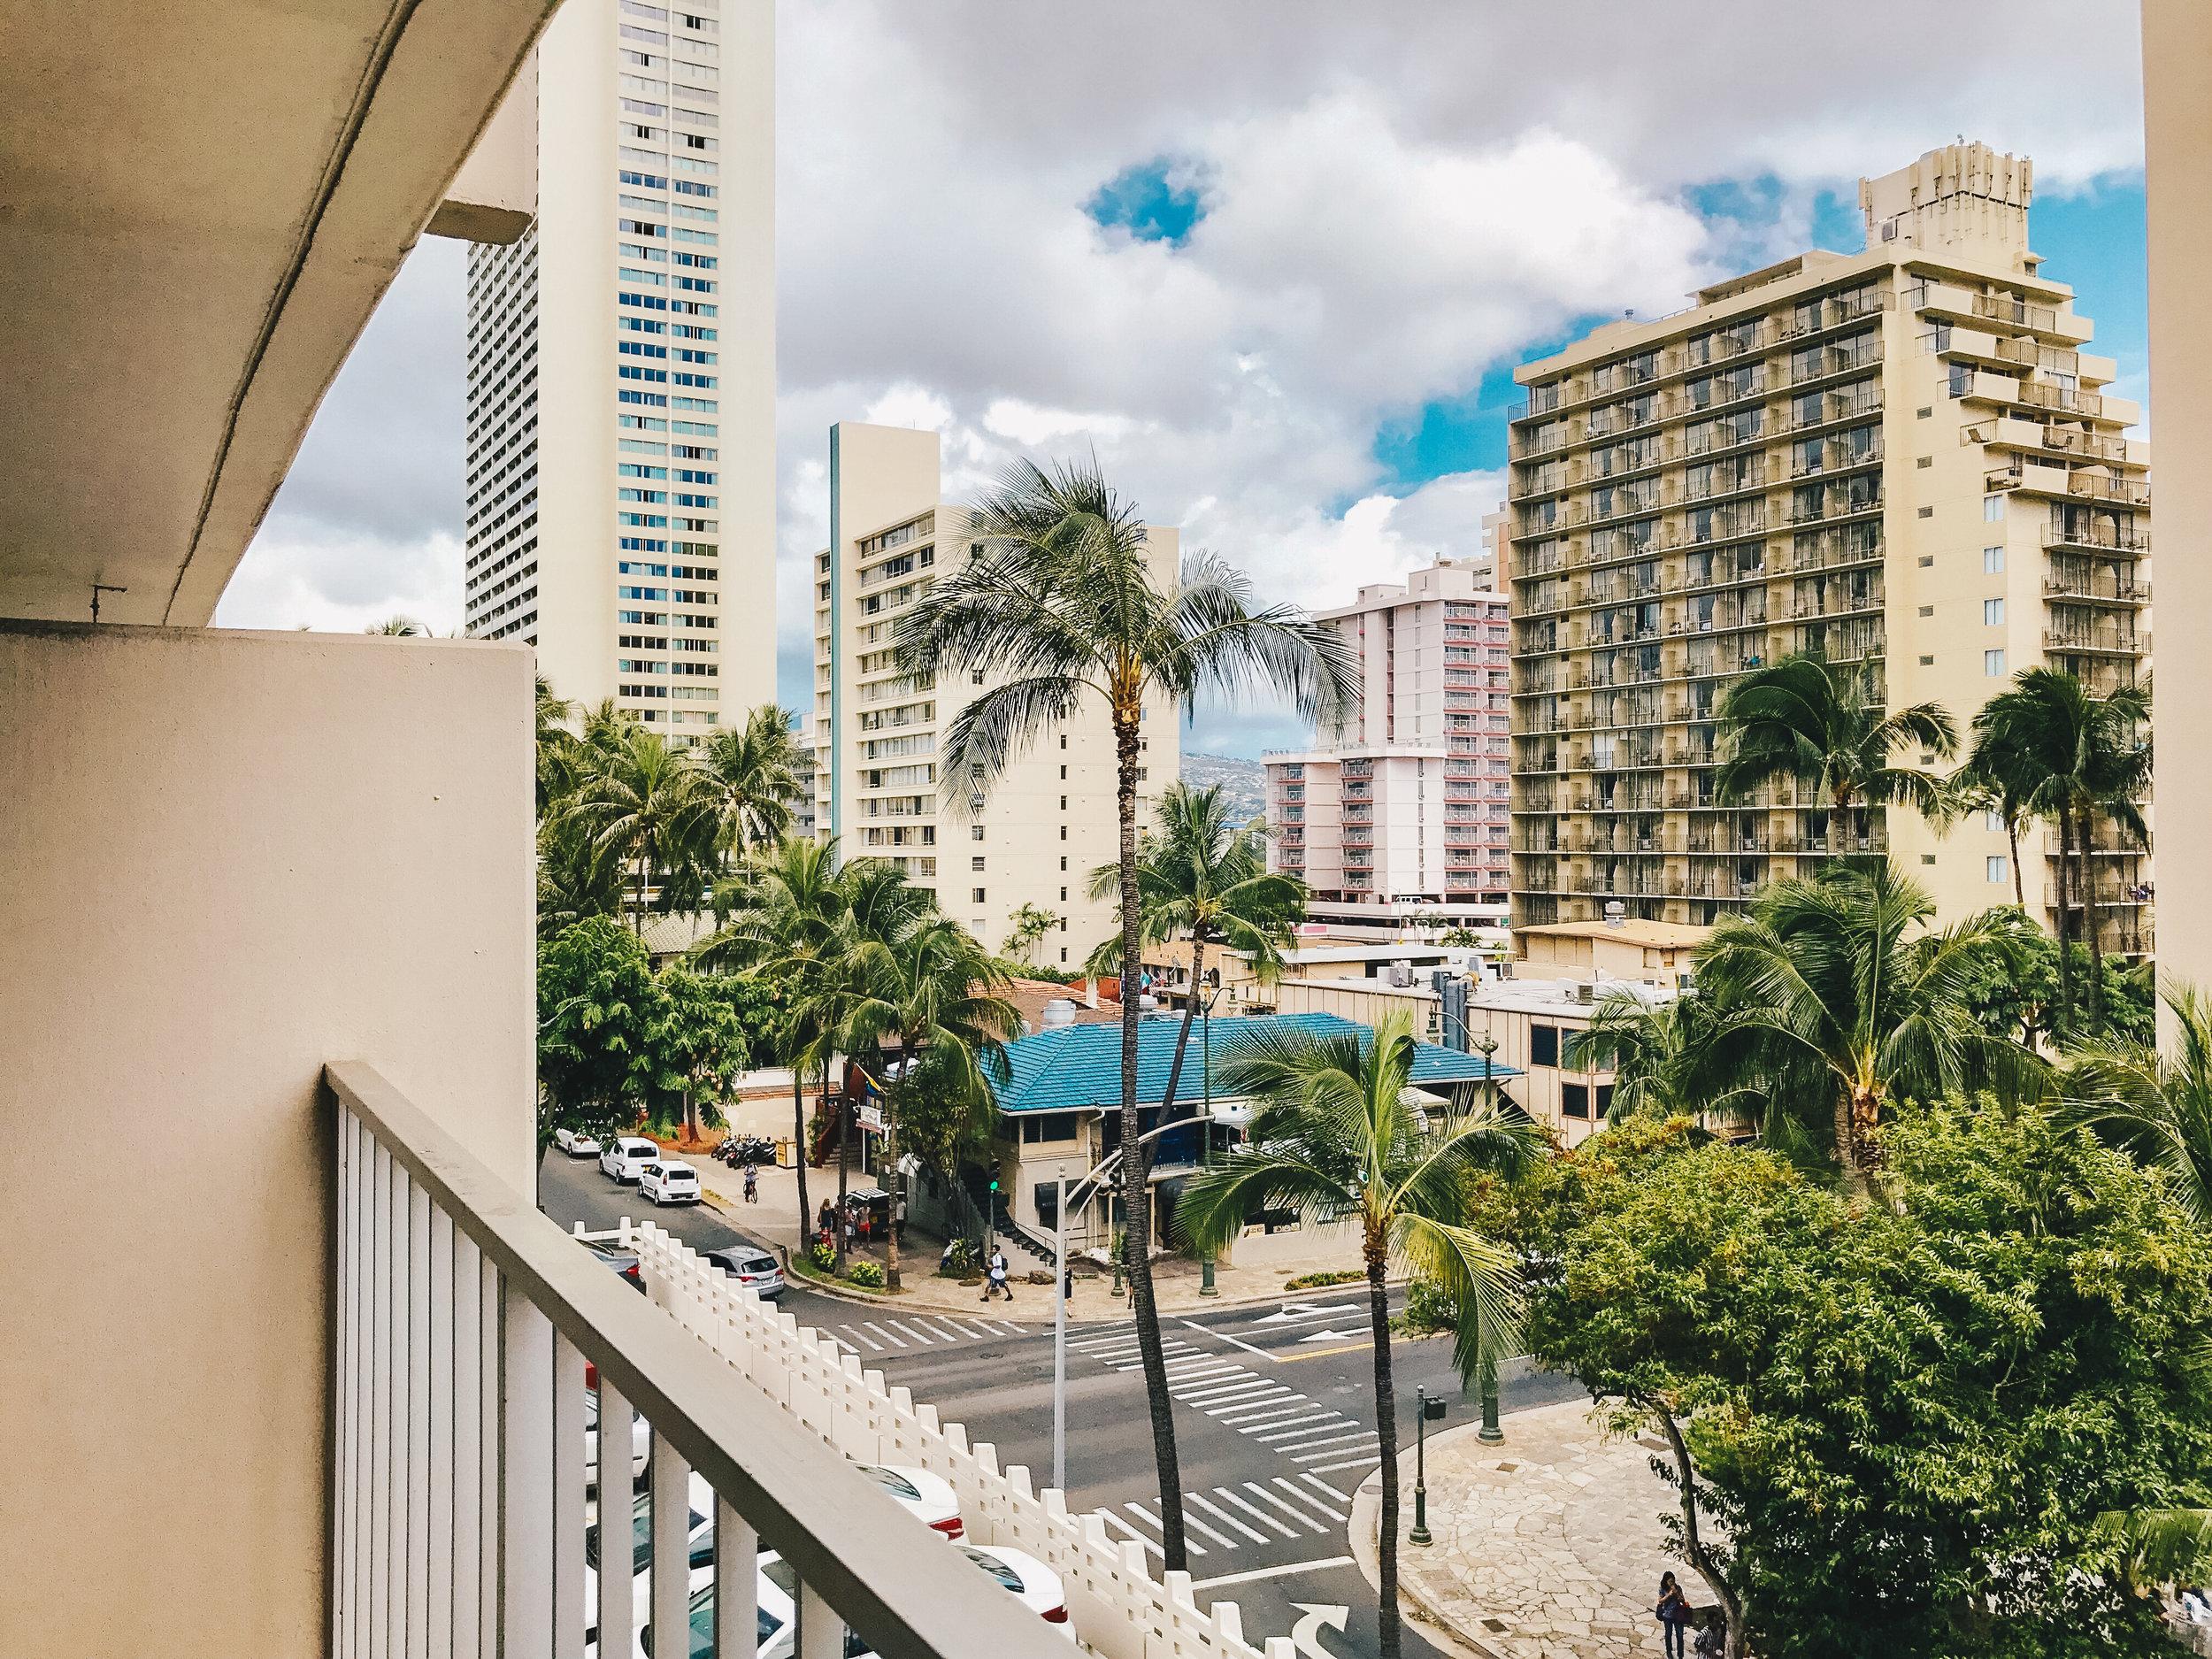 Taken at an  Airbnb  in Honolulu, Hawaii.